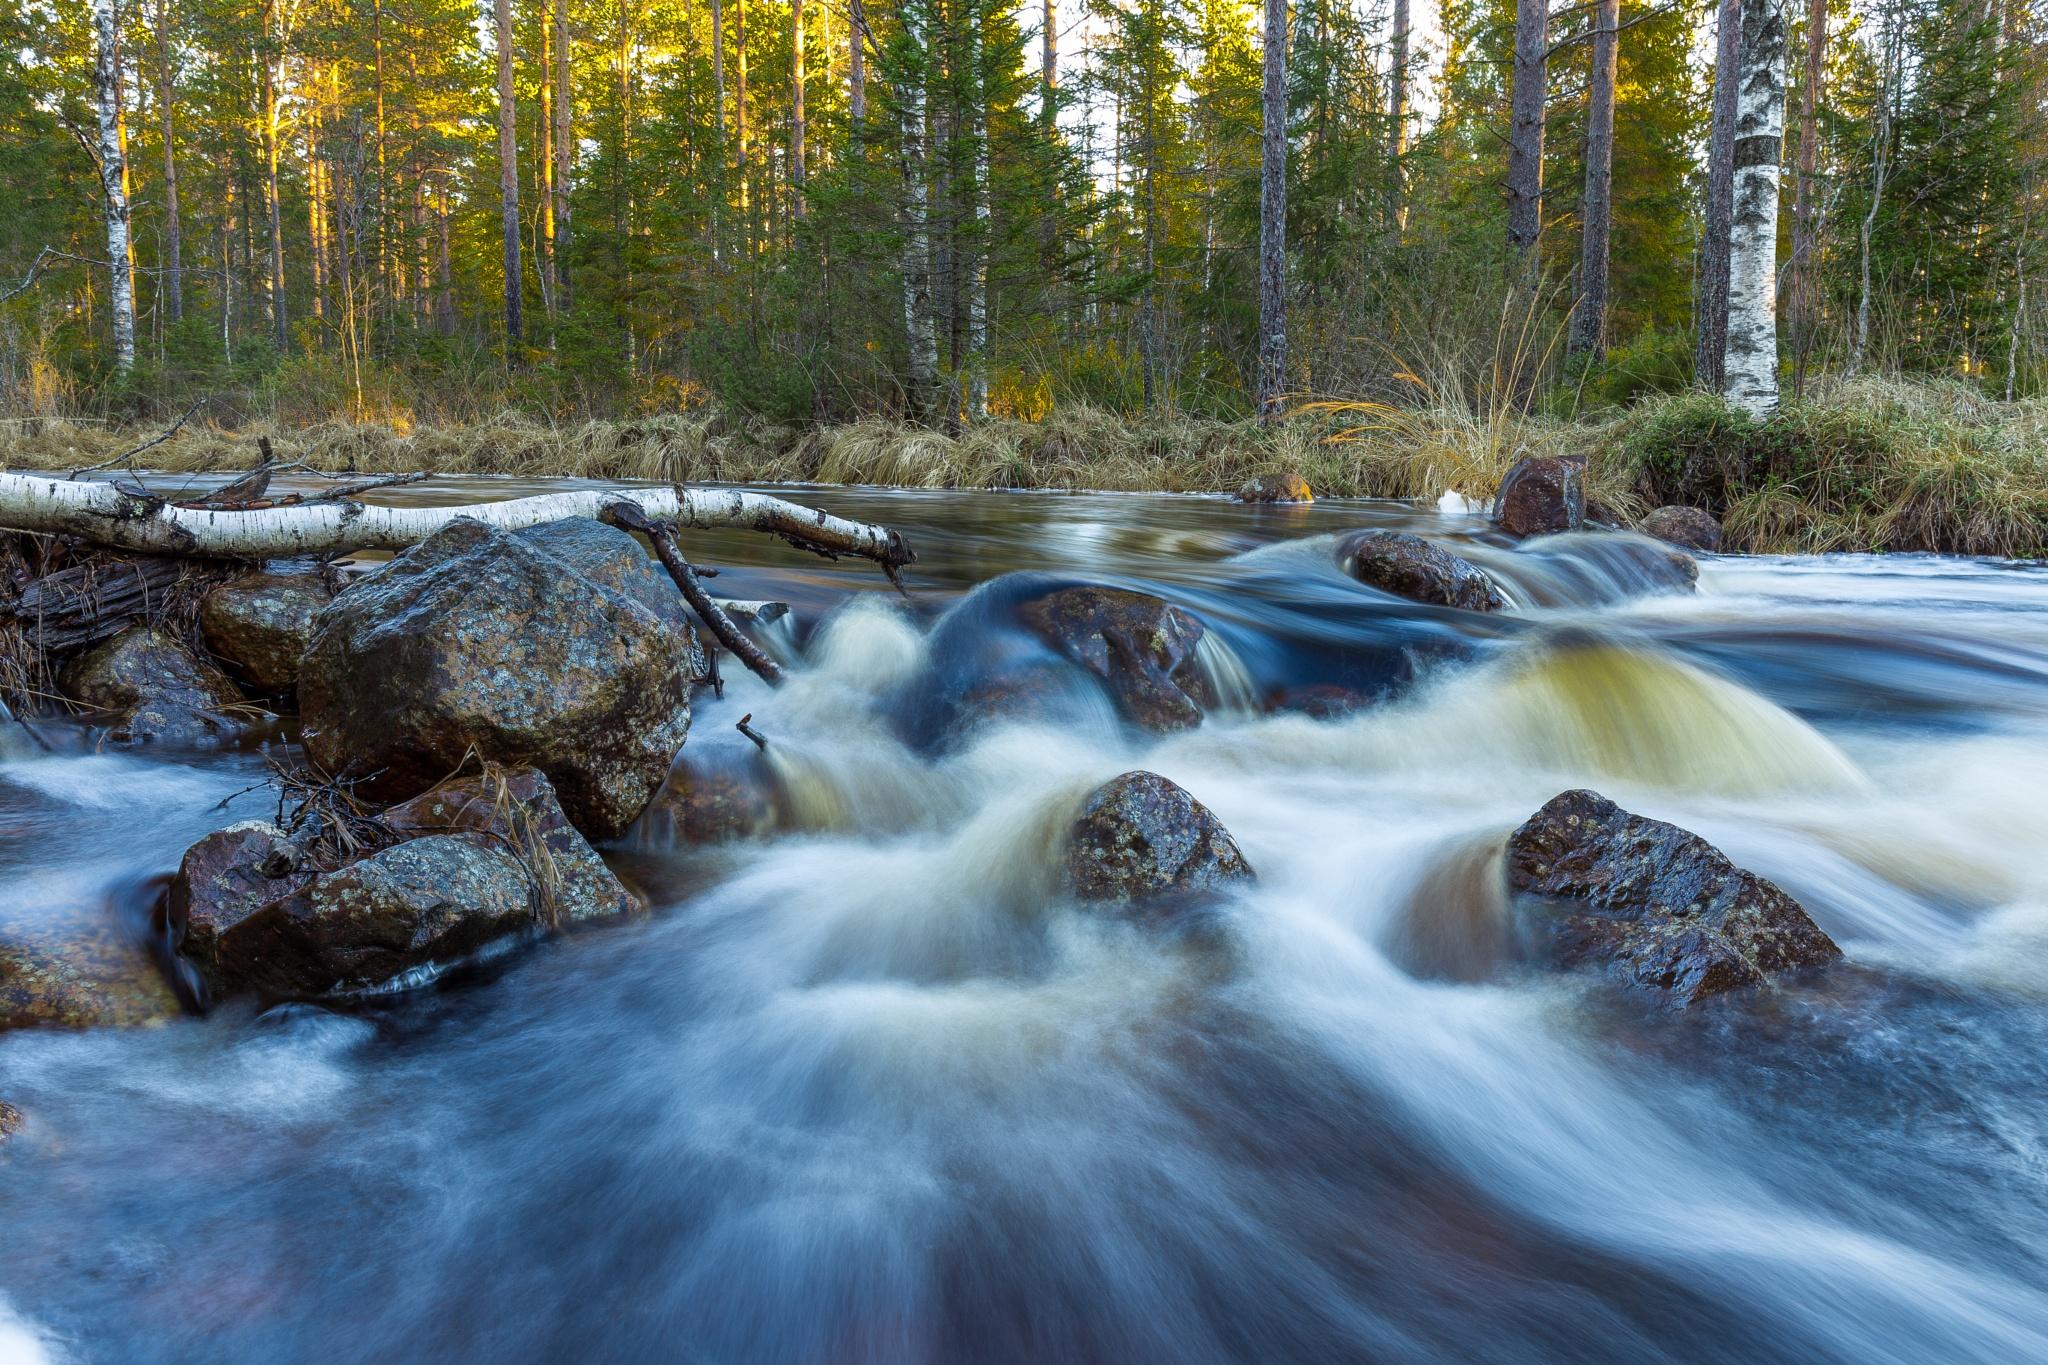 Water stream in December by SRFOTO